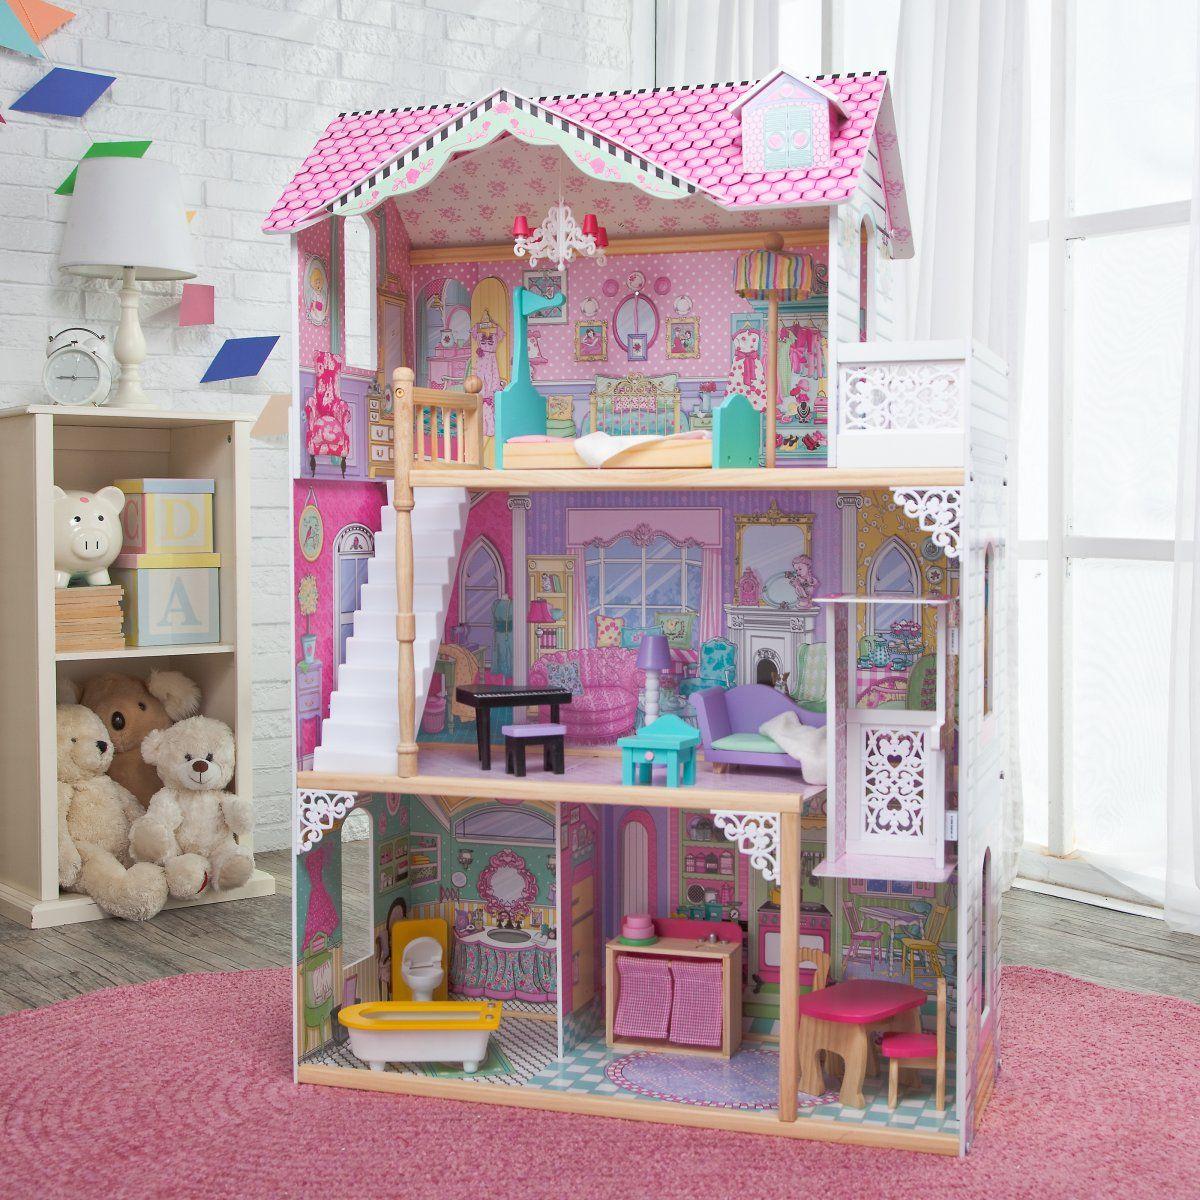 Kidkraft annabelle dollhouse x 16w x 47h doll house pinterest mu ecas - Kidkraft espana ...